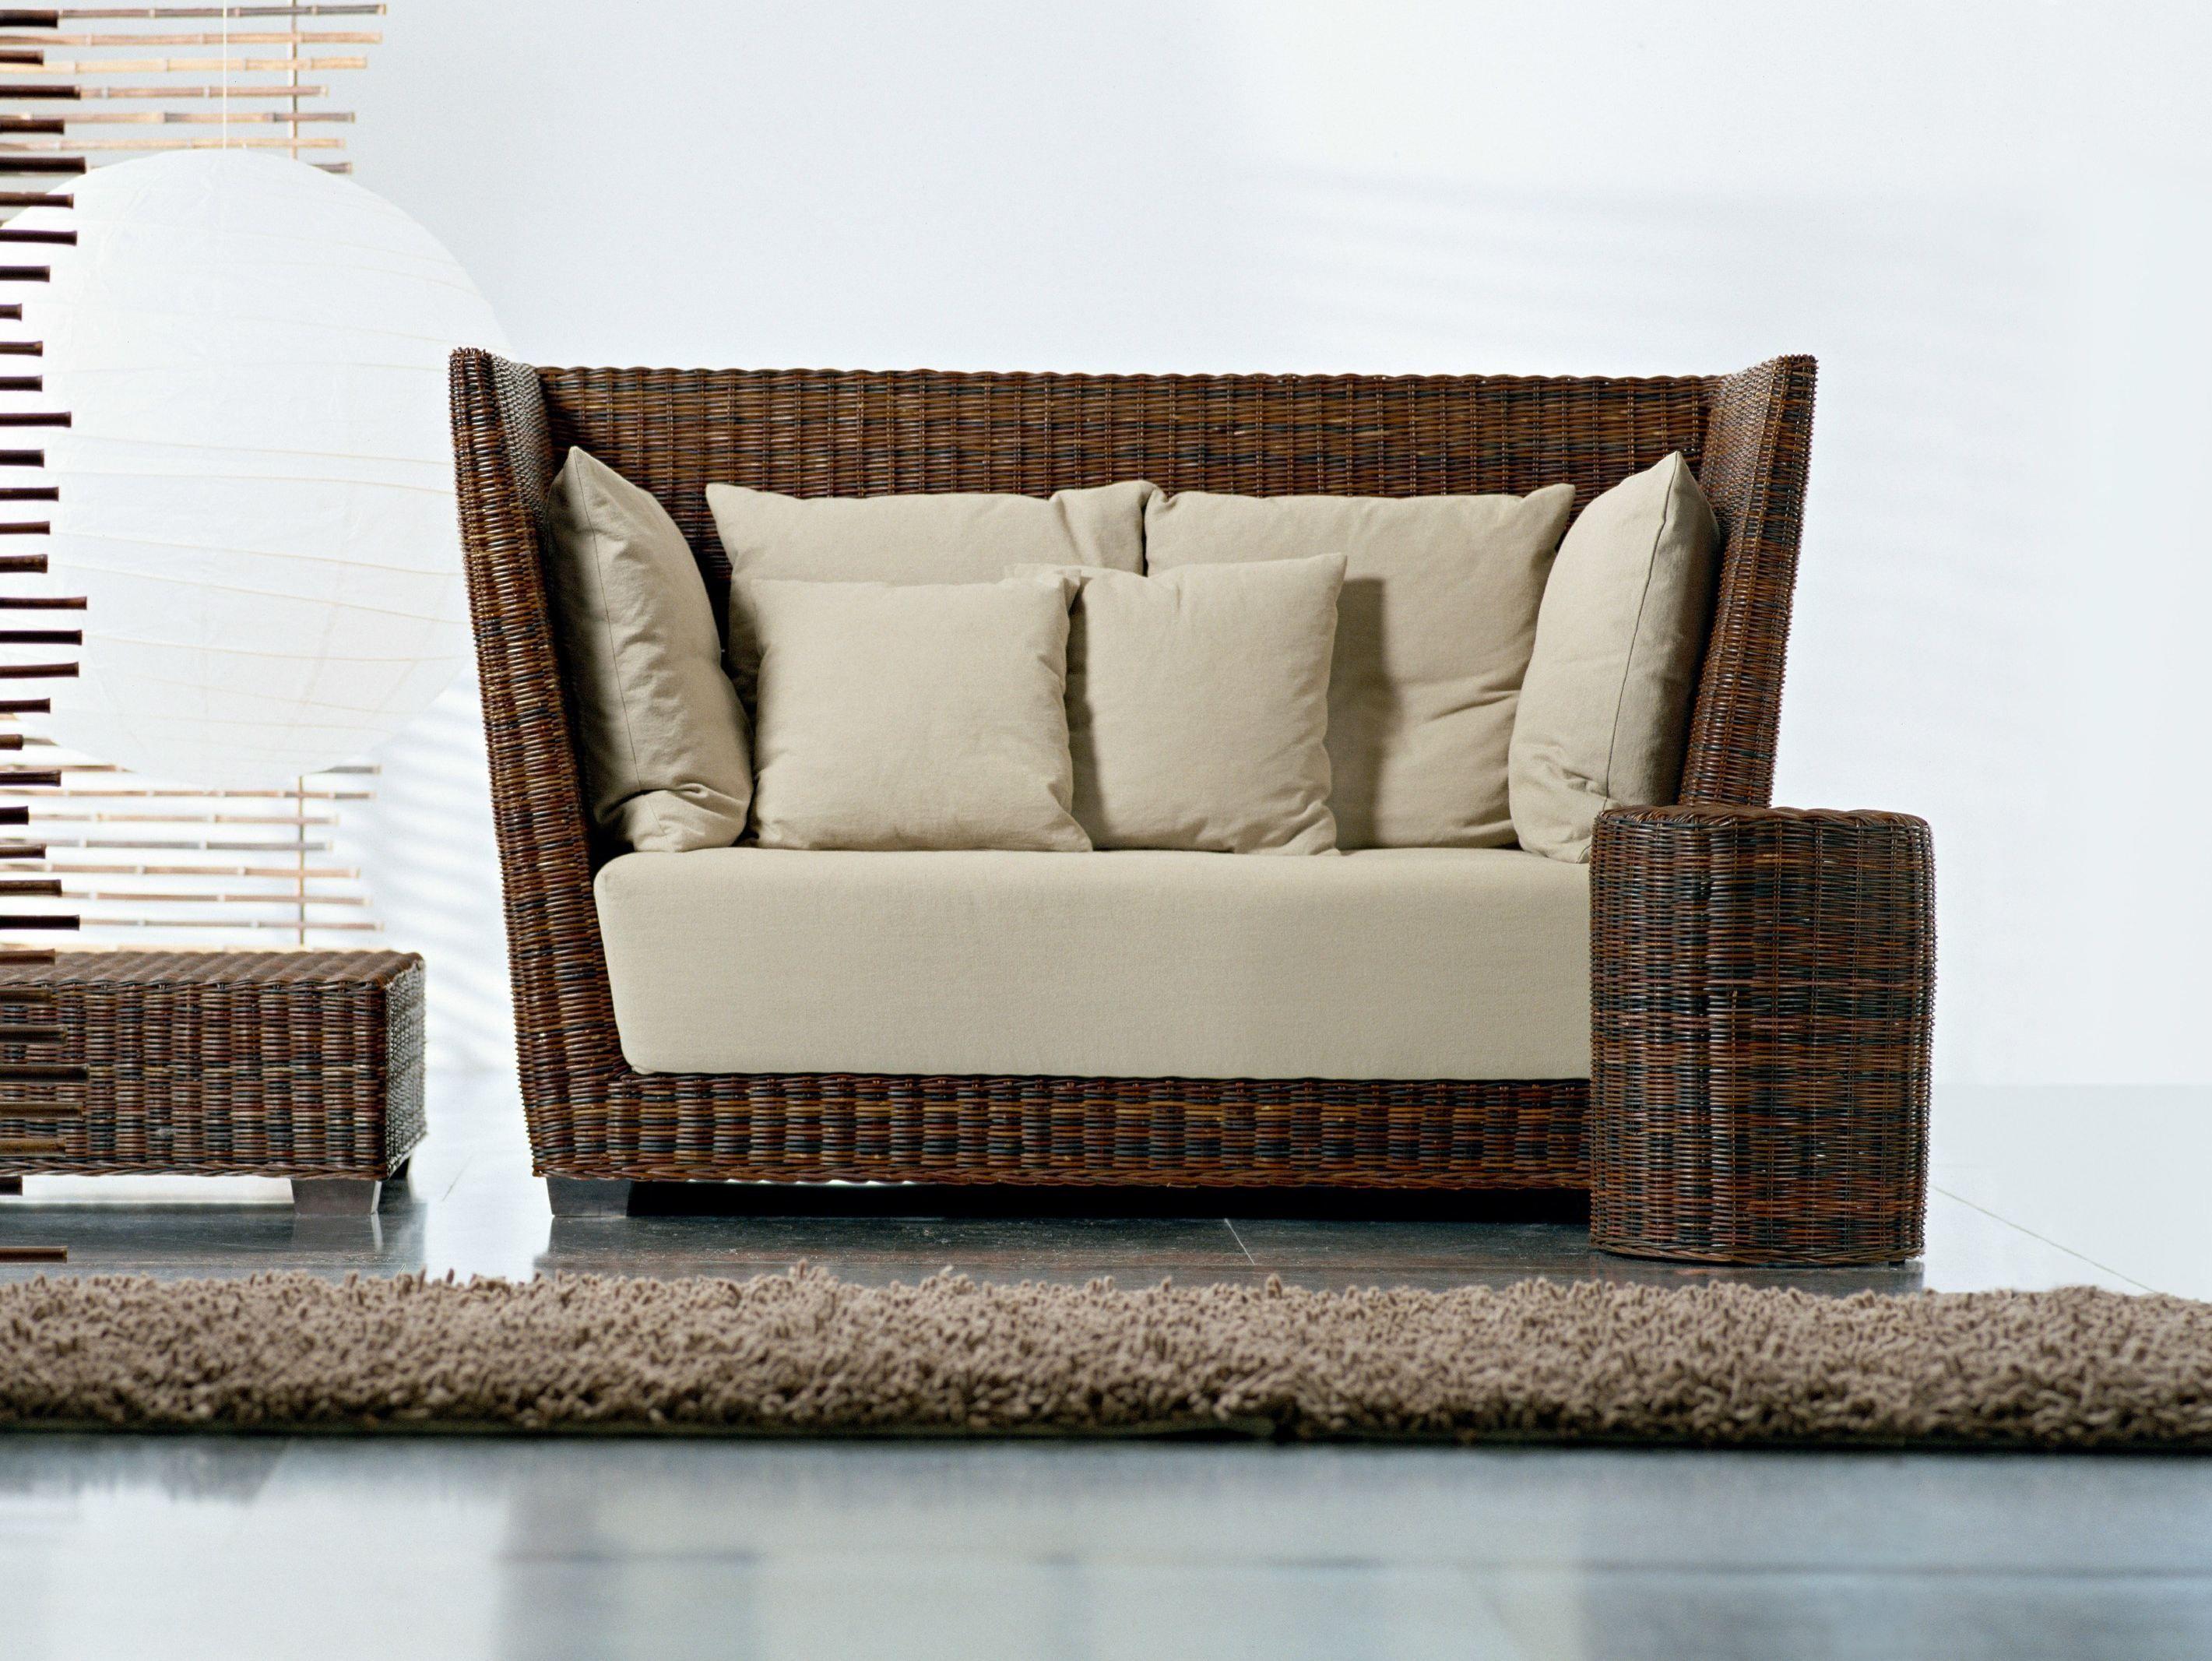 sofa hohe lehne excellent leder couch von laauser zweimal wohnzimmer sofa sitzgruppe with sofa. Black Bedroom Furniture Sets. Home Design Ideas